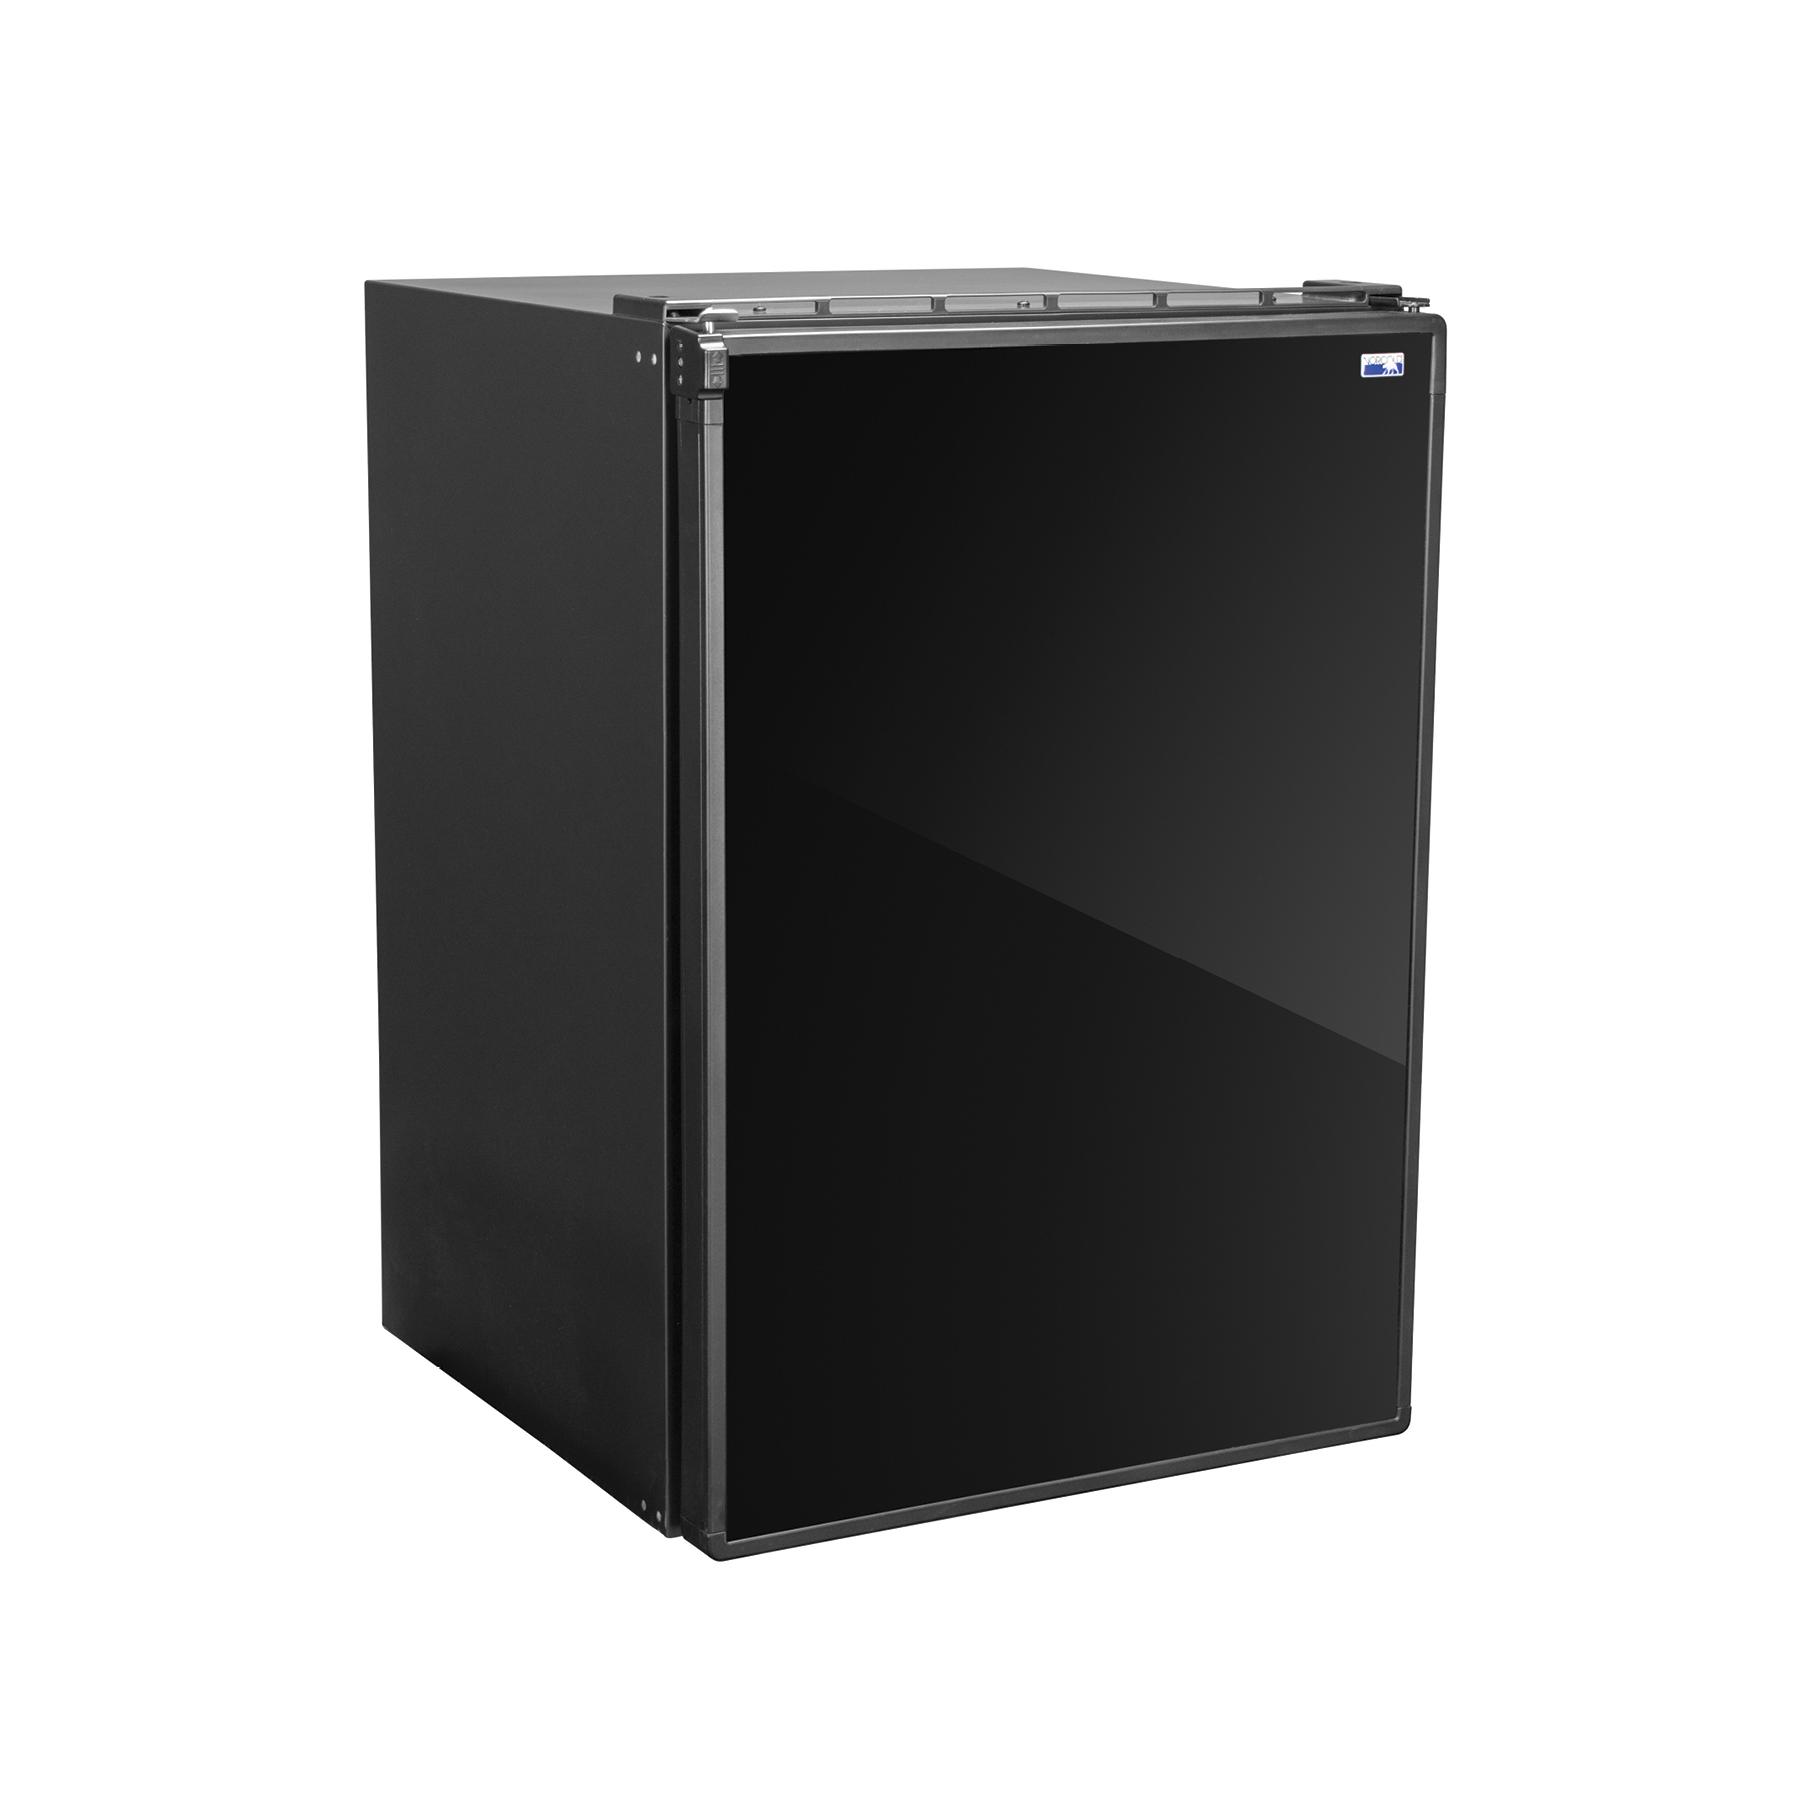 DE105 COMPRESSOR REFRIGERATOR – 105L